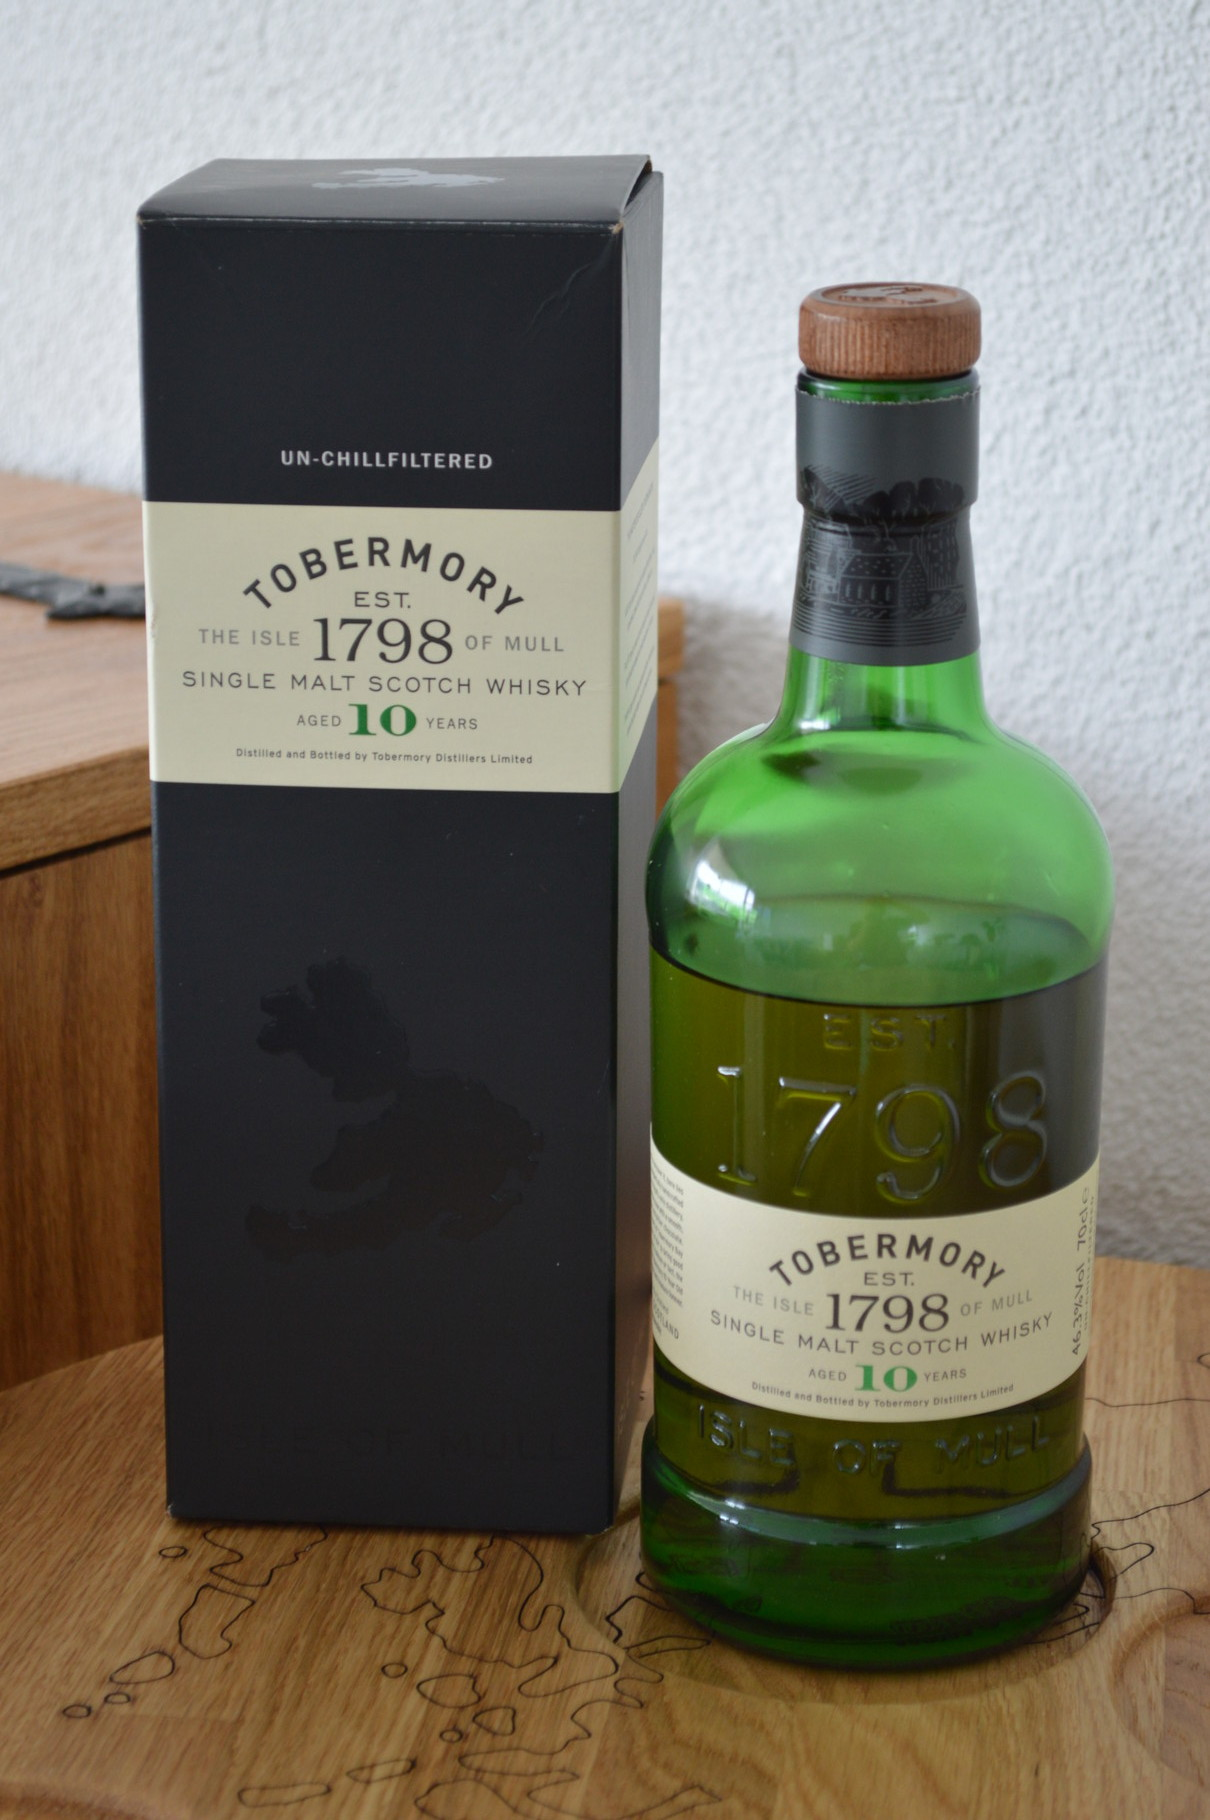 ISLANDS - Tobermory* - Aged: 10 years - Bottler: Original - 70cl - 46,3%